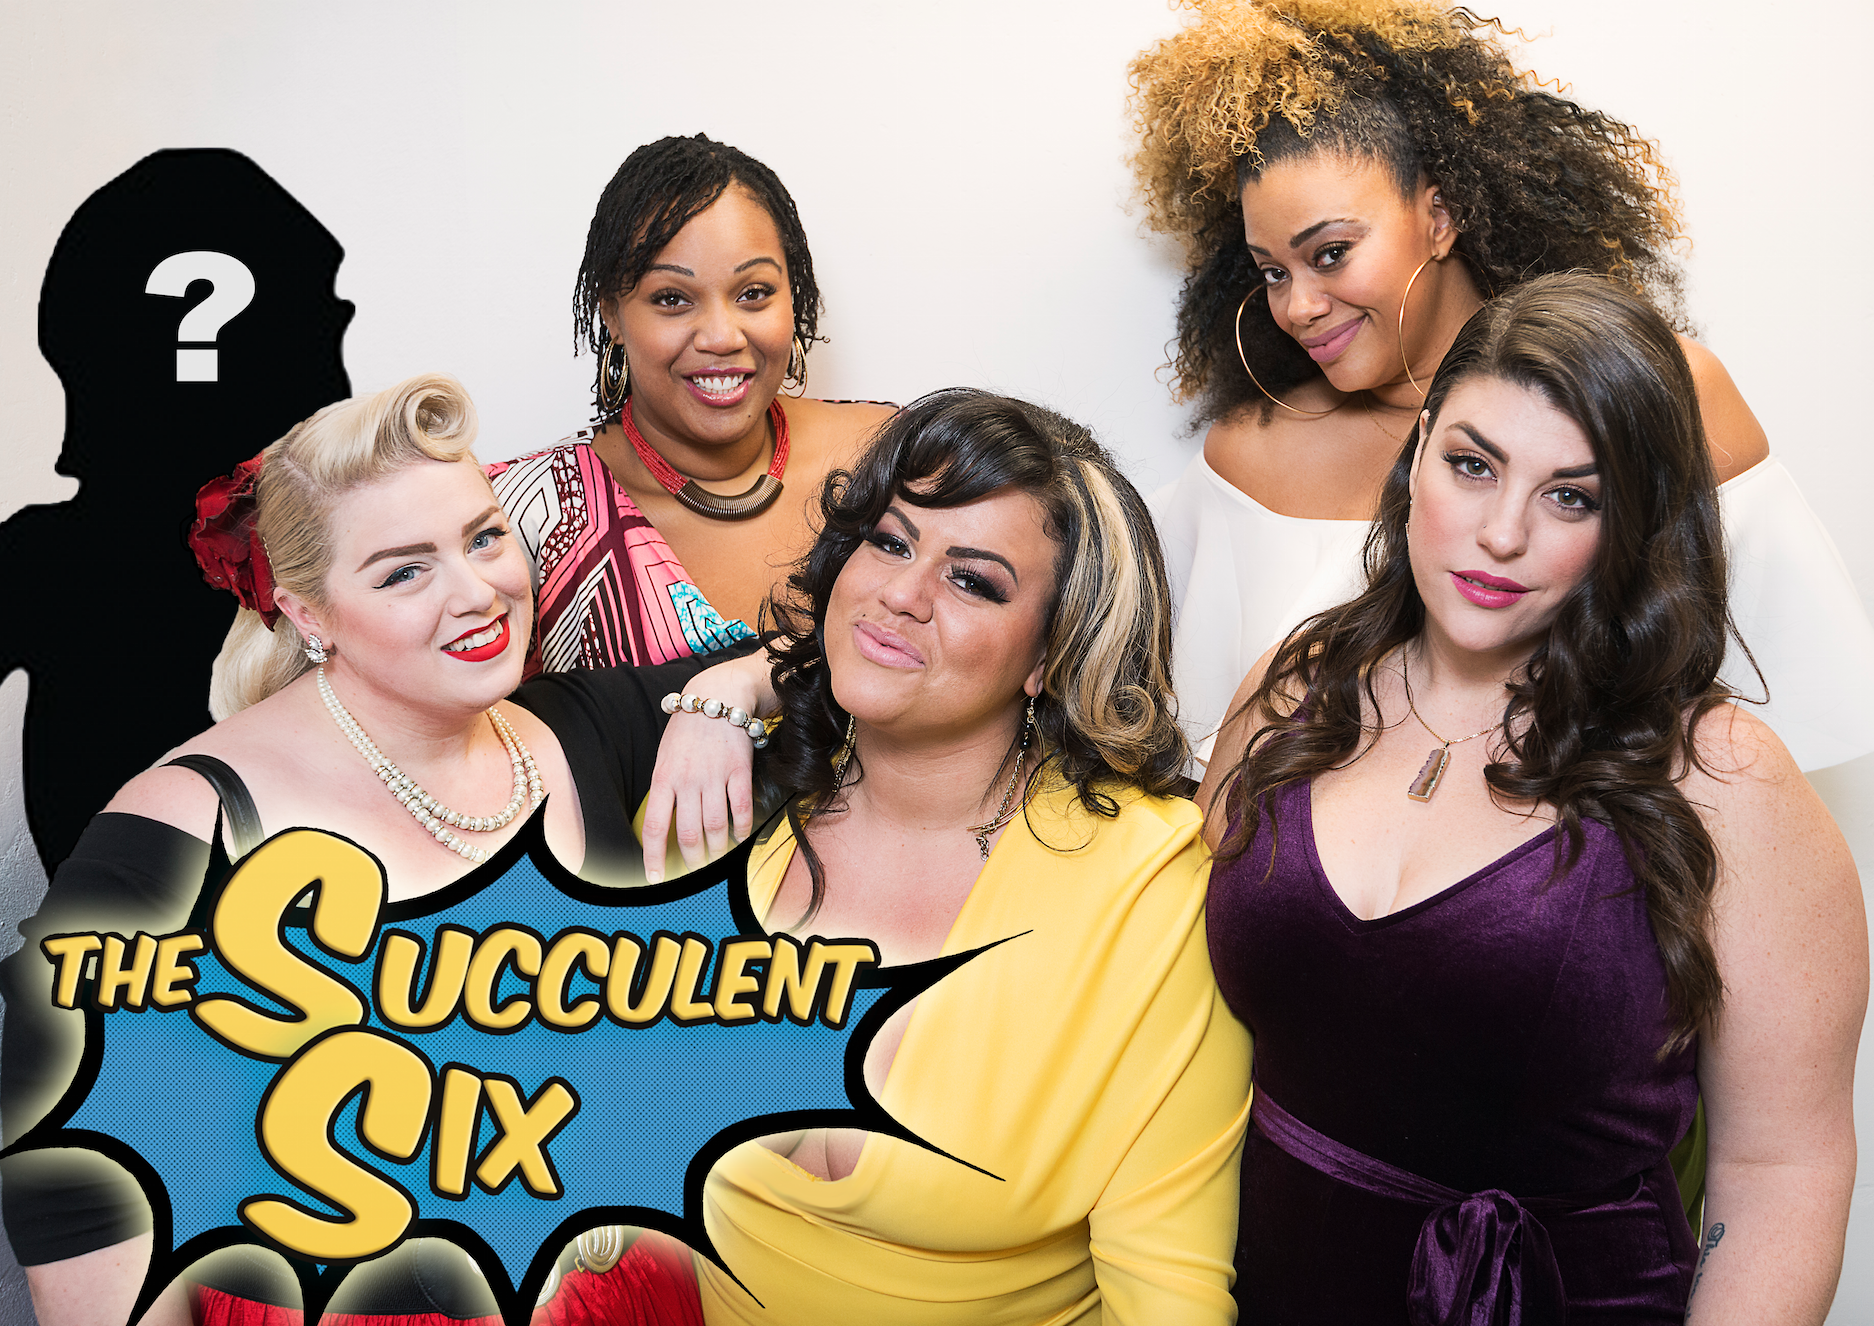 The Succulent Six